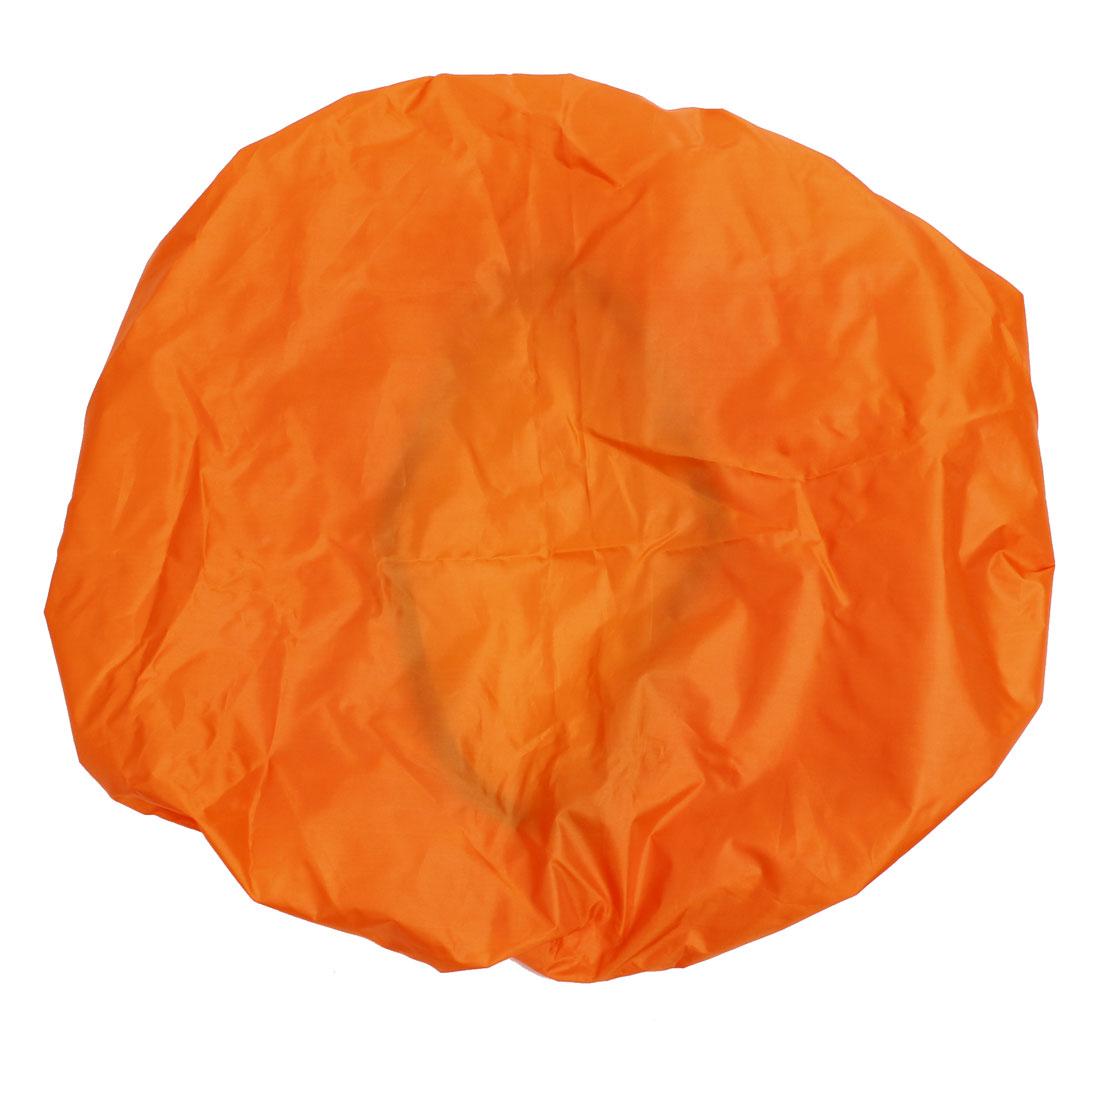 Unique Bargains Wilderness Survival Gear Protective Waterproof Backpack Cover 35L Orange